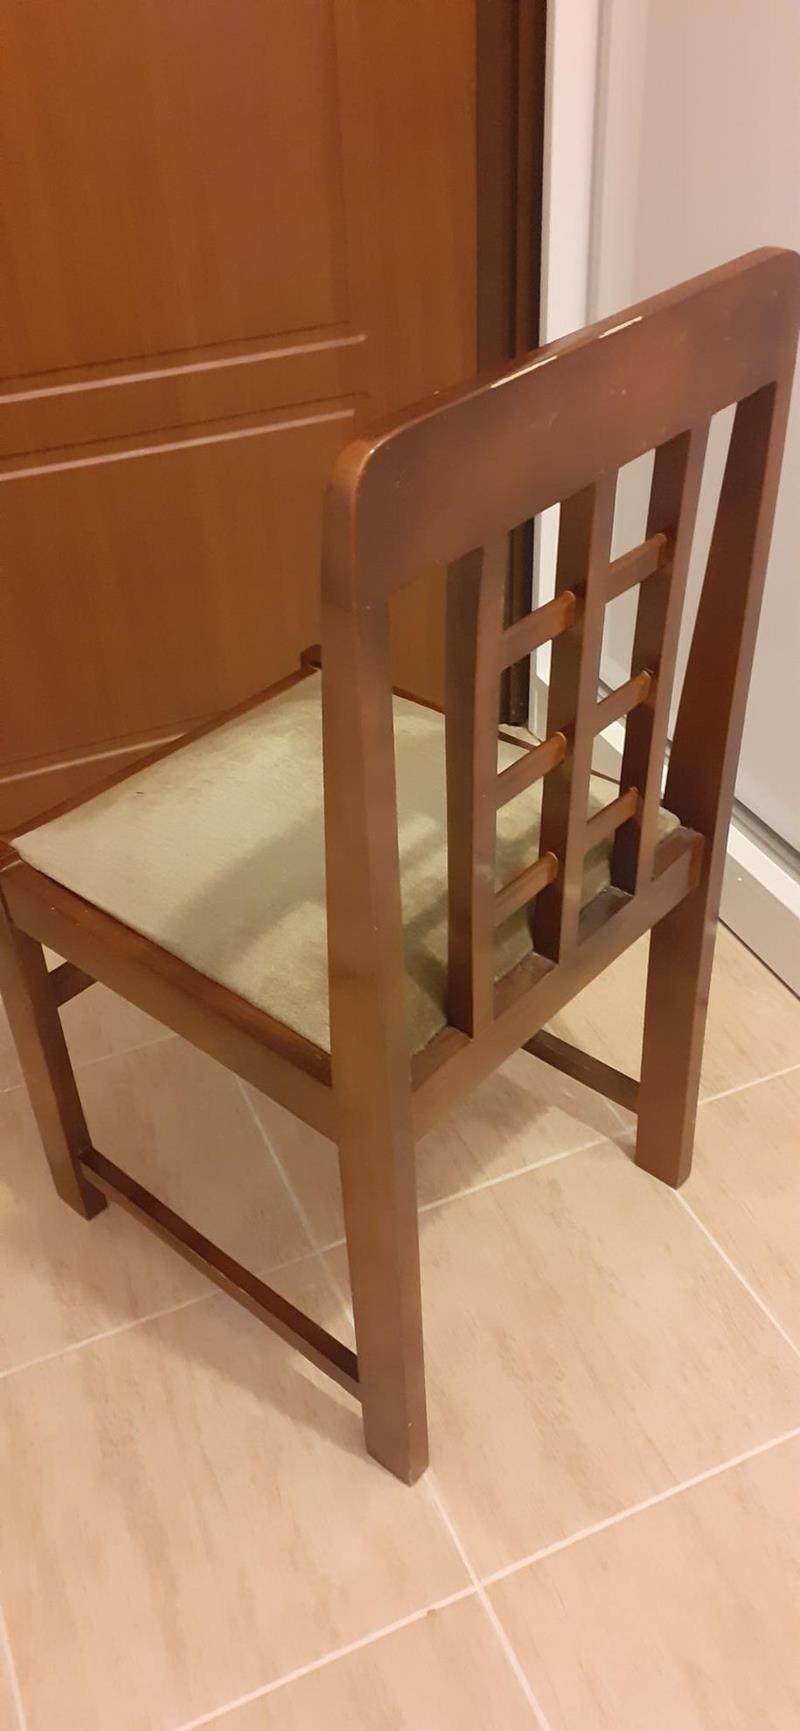 4 adet sandalye resmi